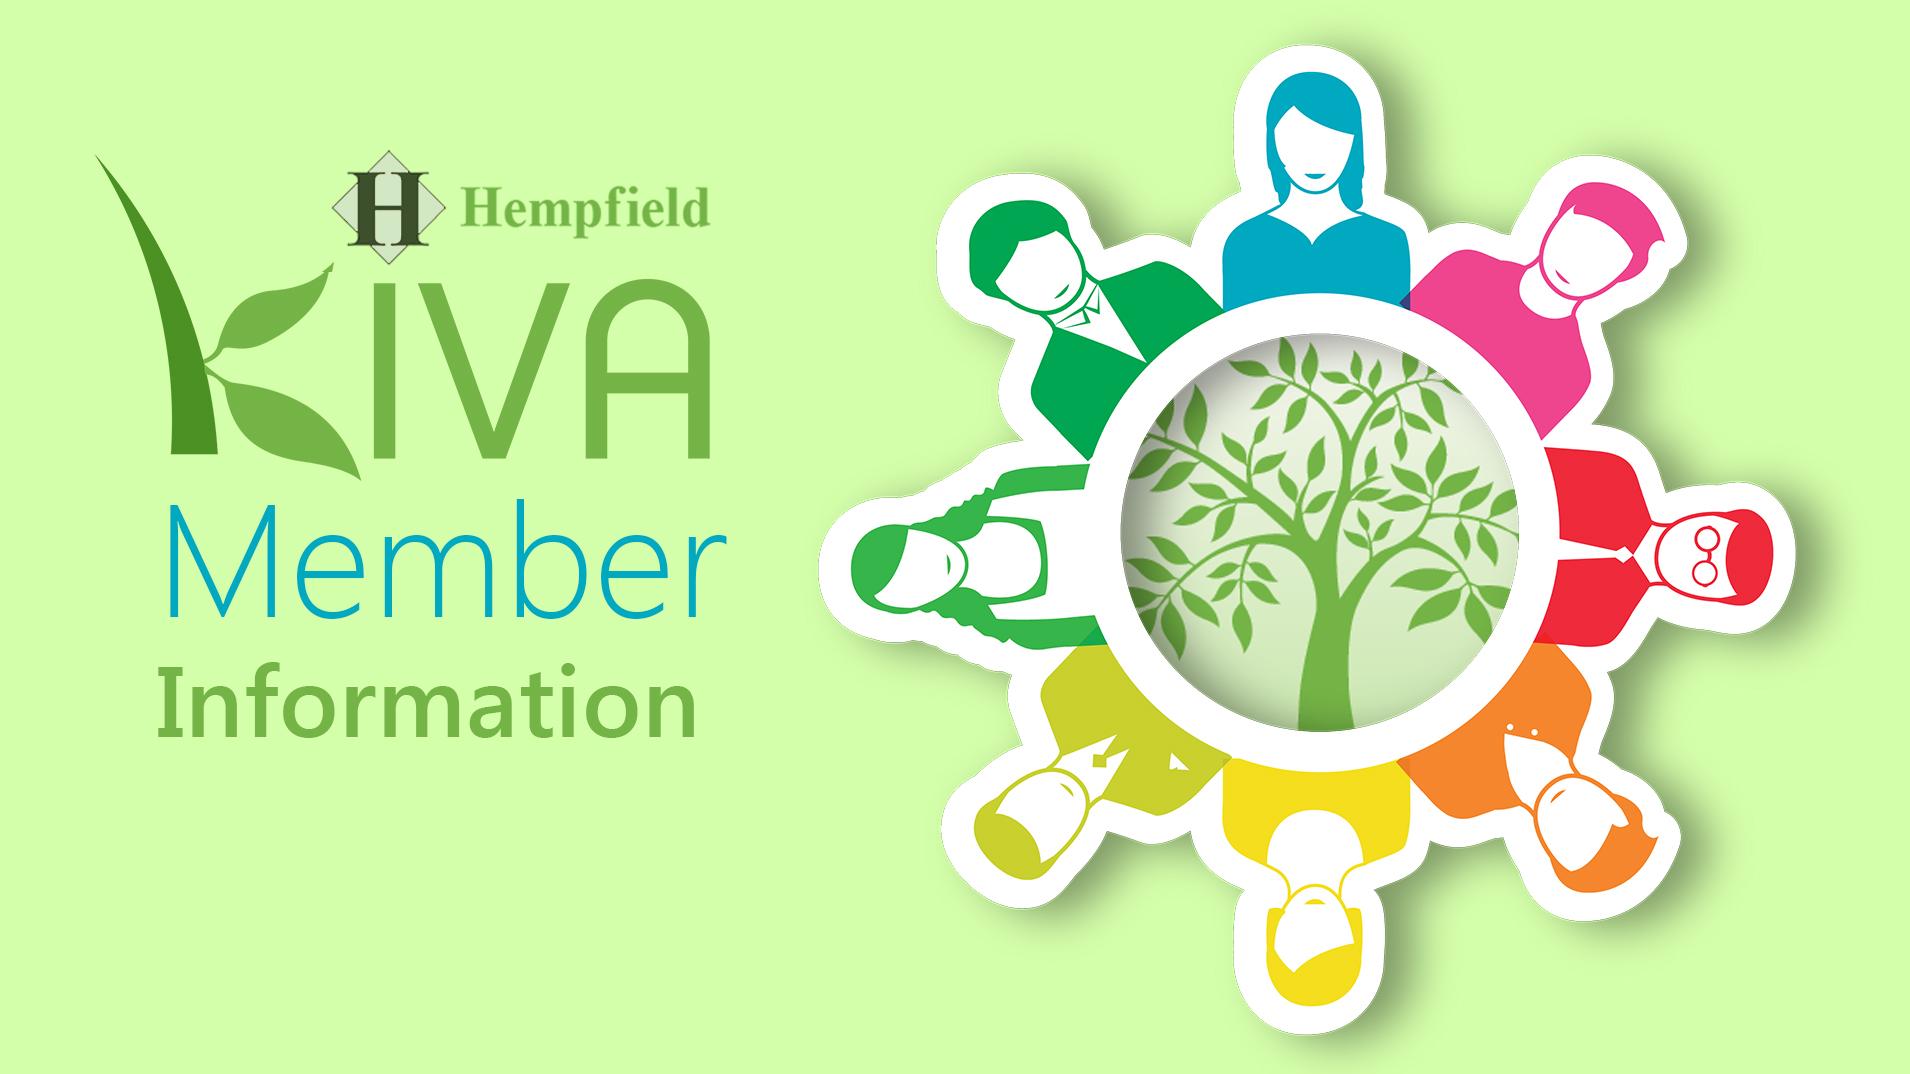 Hempfield Kiva Member Info